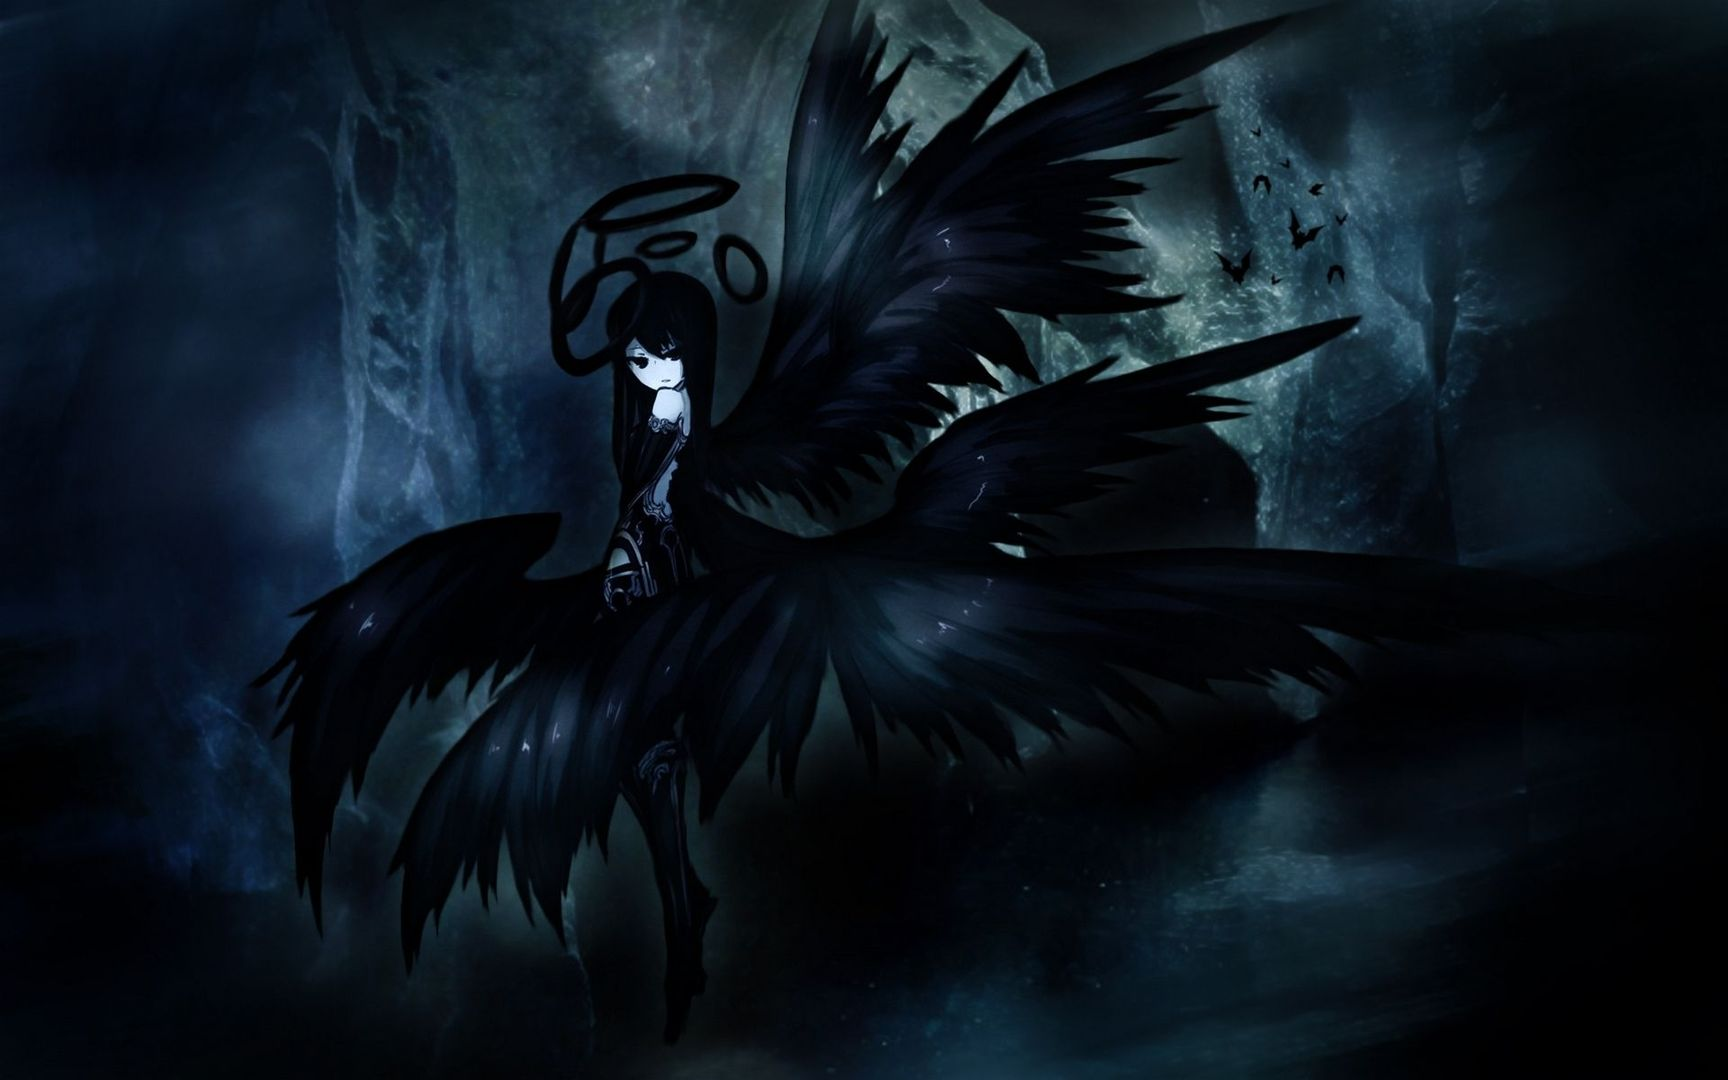 Download Anime black angel wallpaper 1728x1080